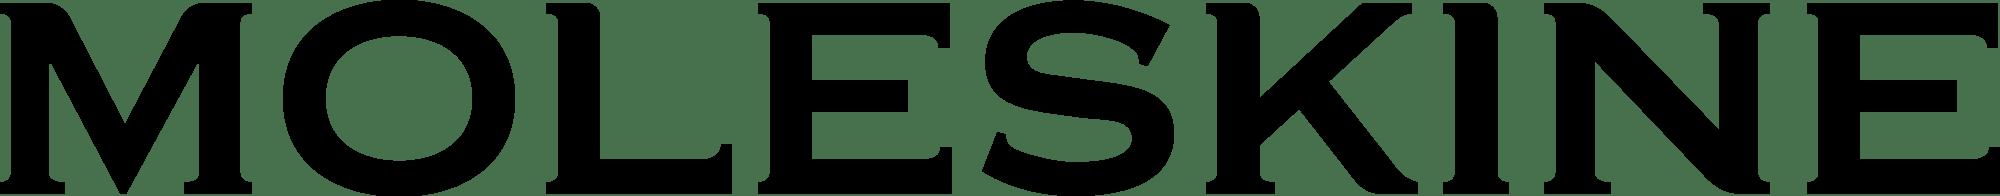 Moleskine logo png Transparent pictures on F.